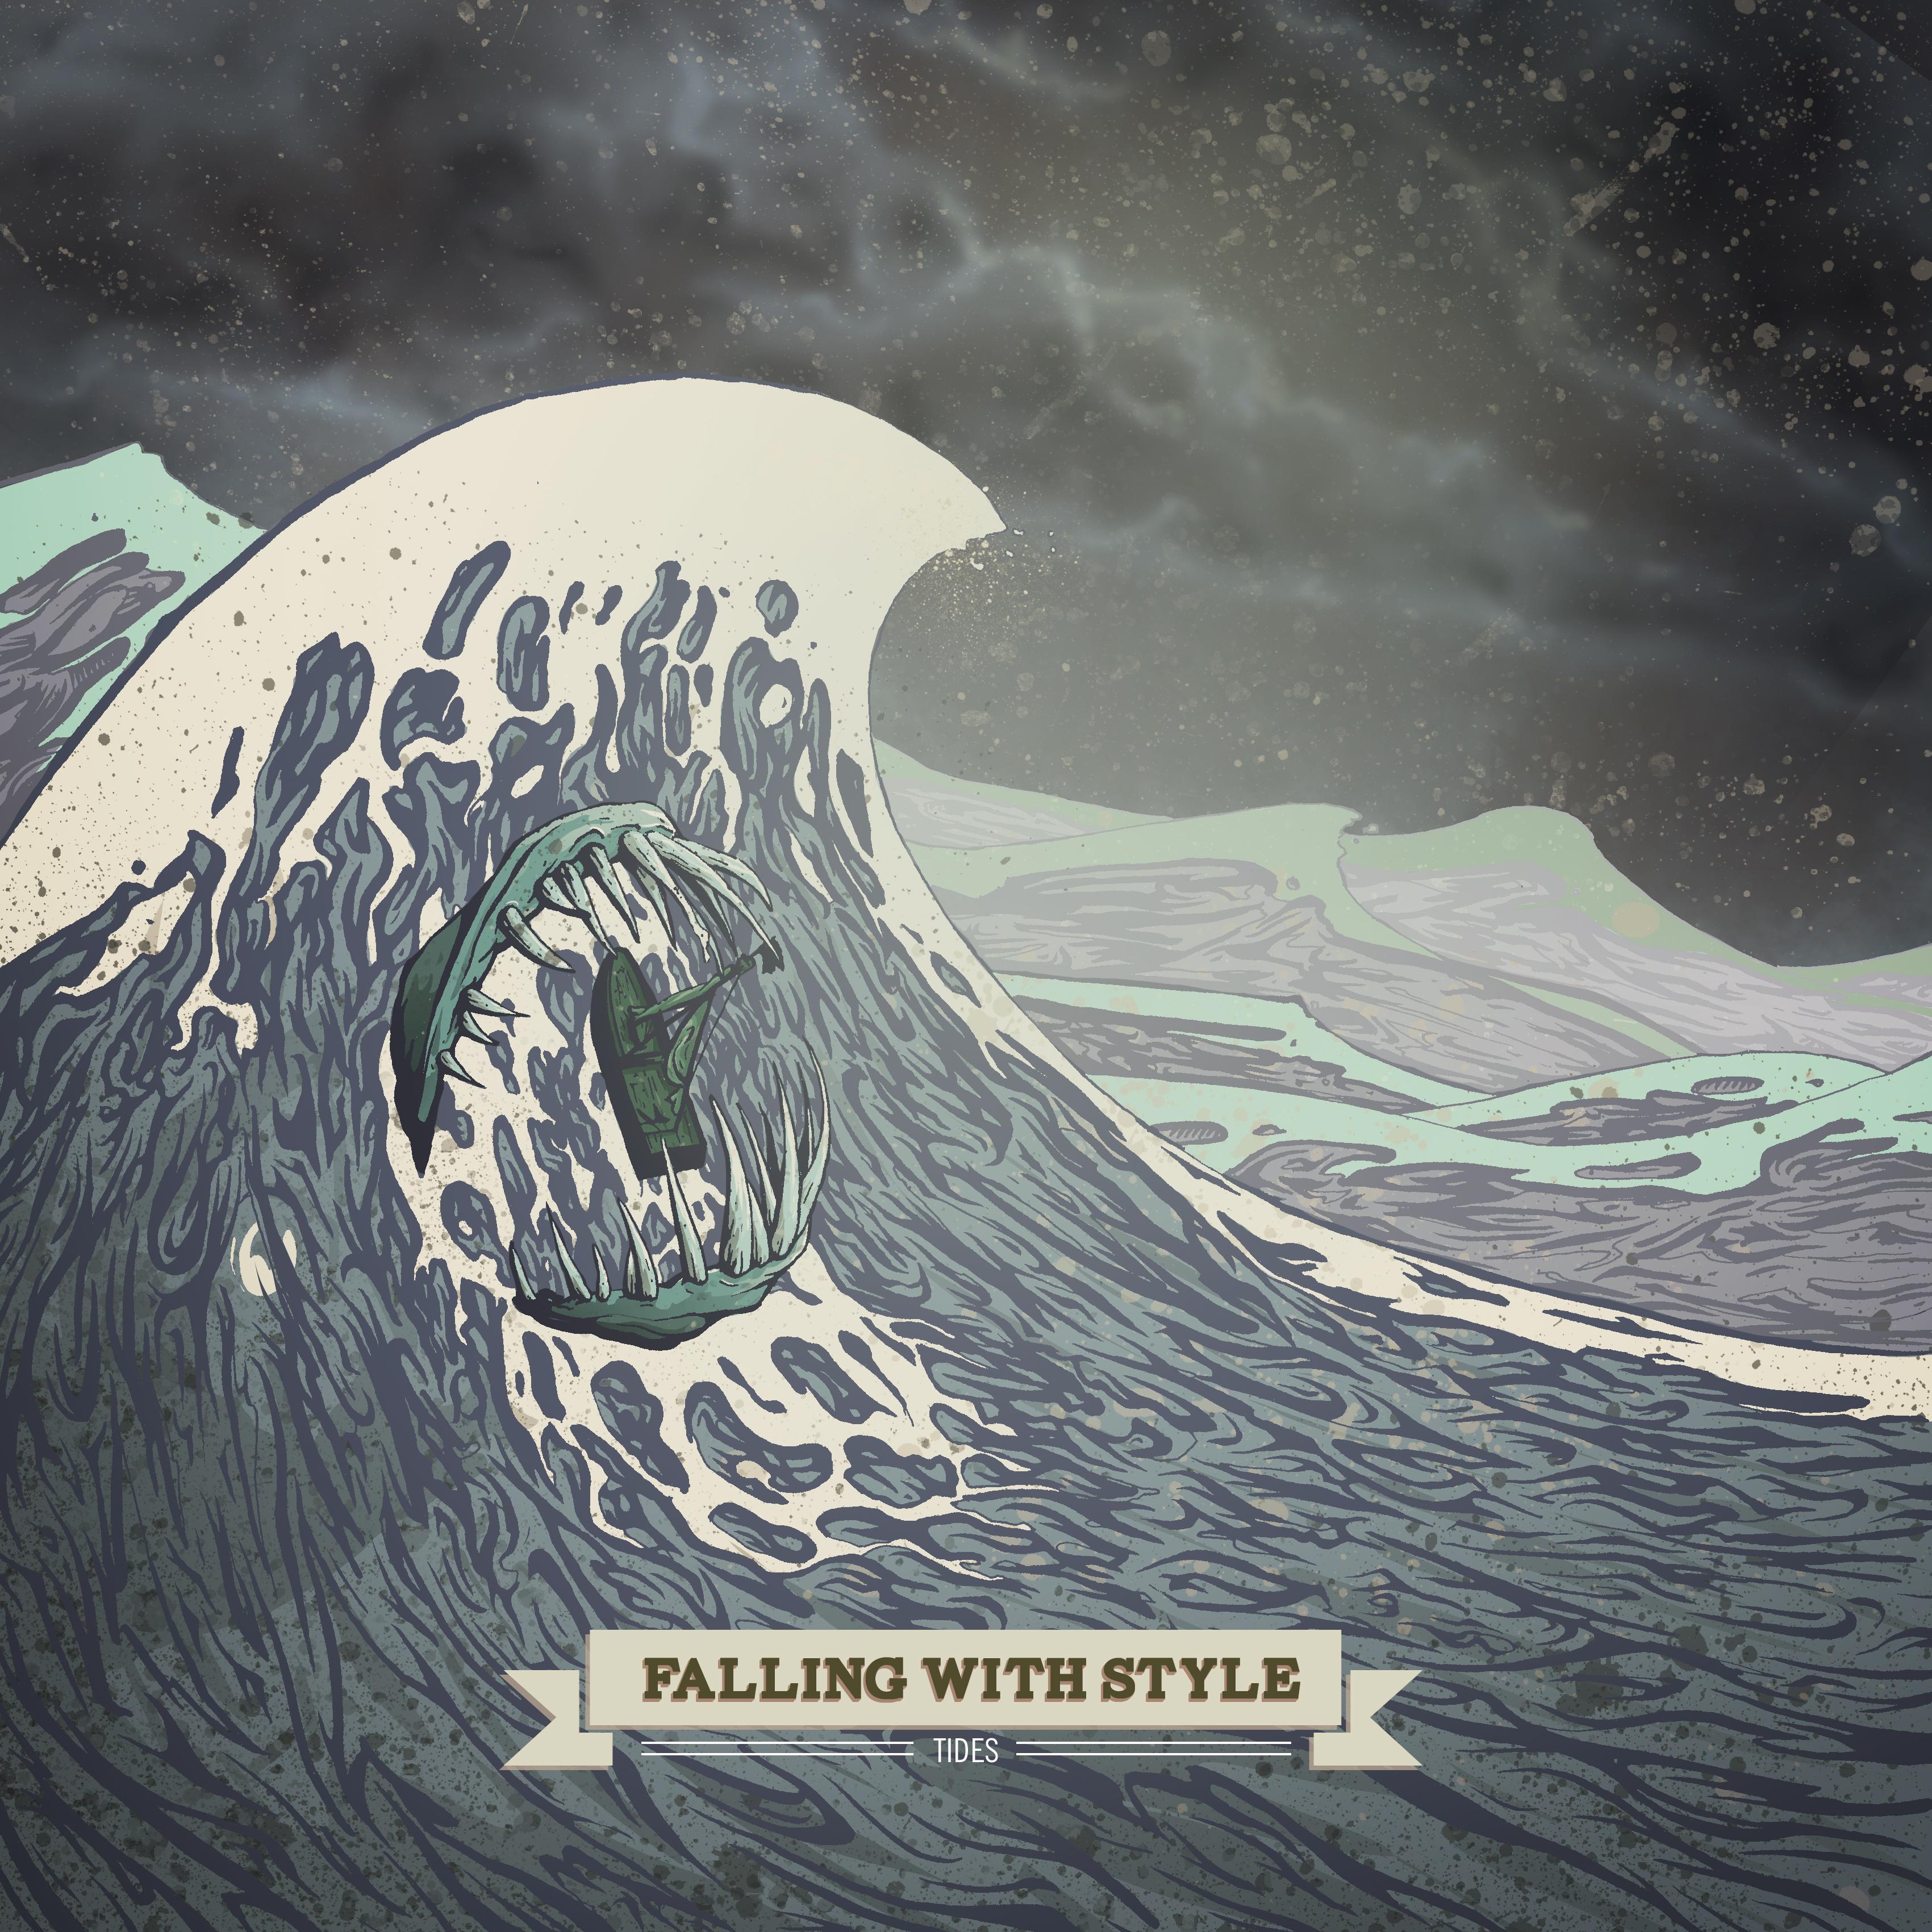 fallingwithstyle_art1